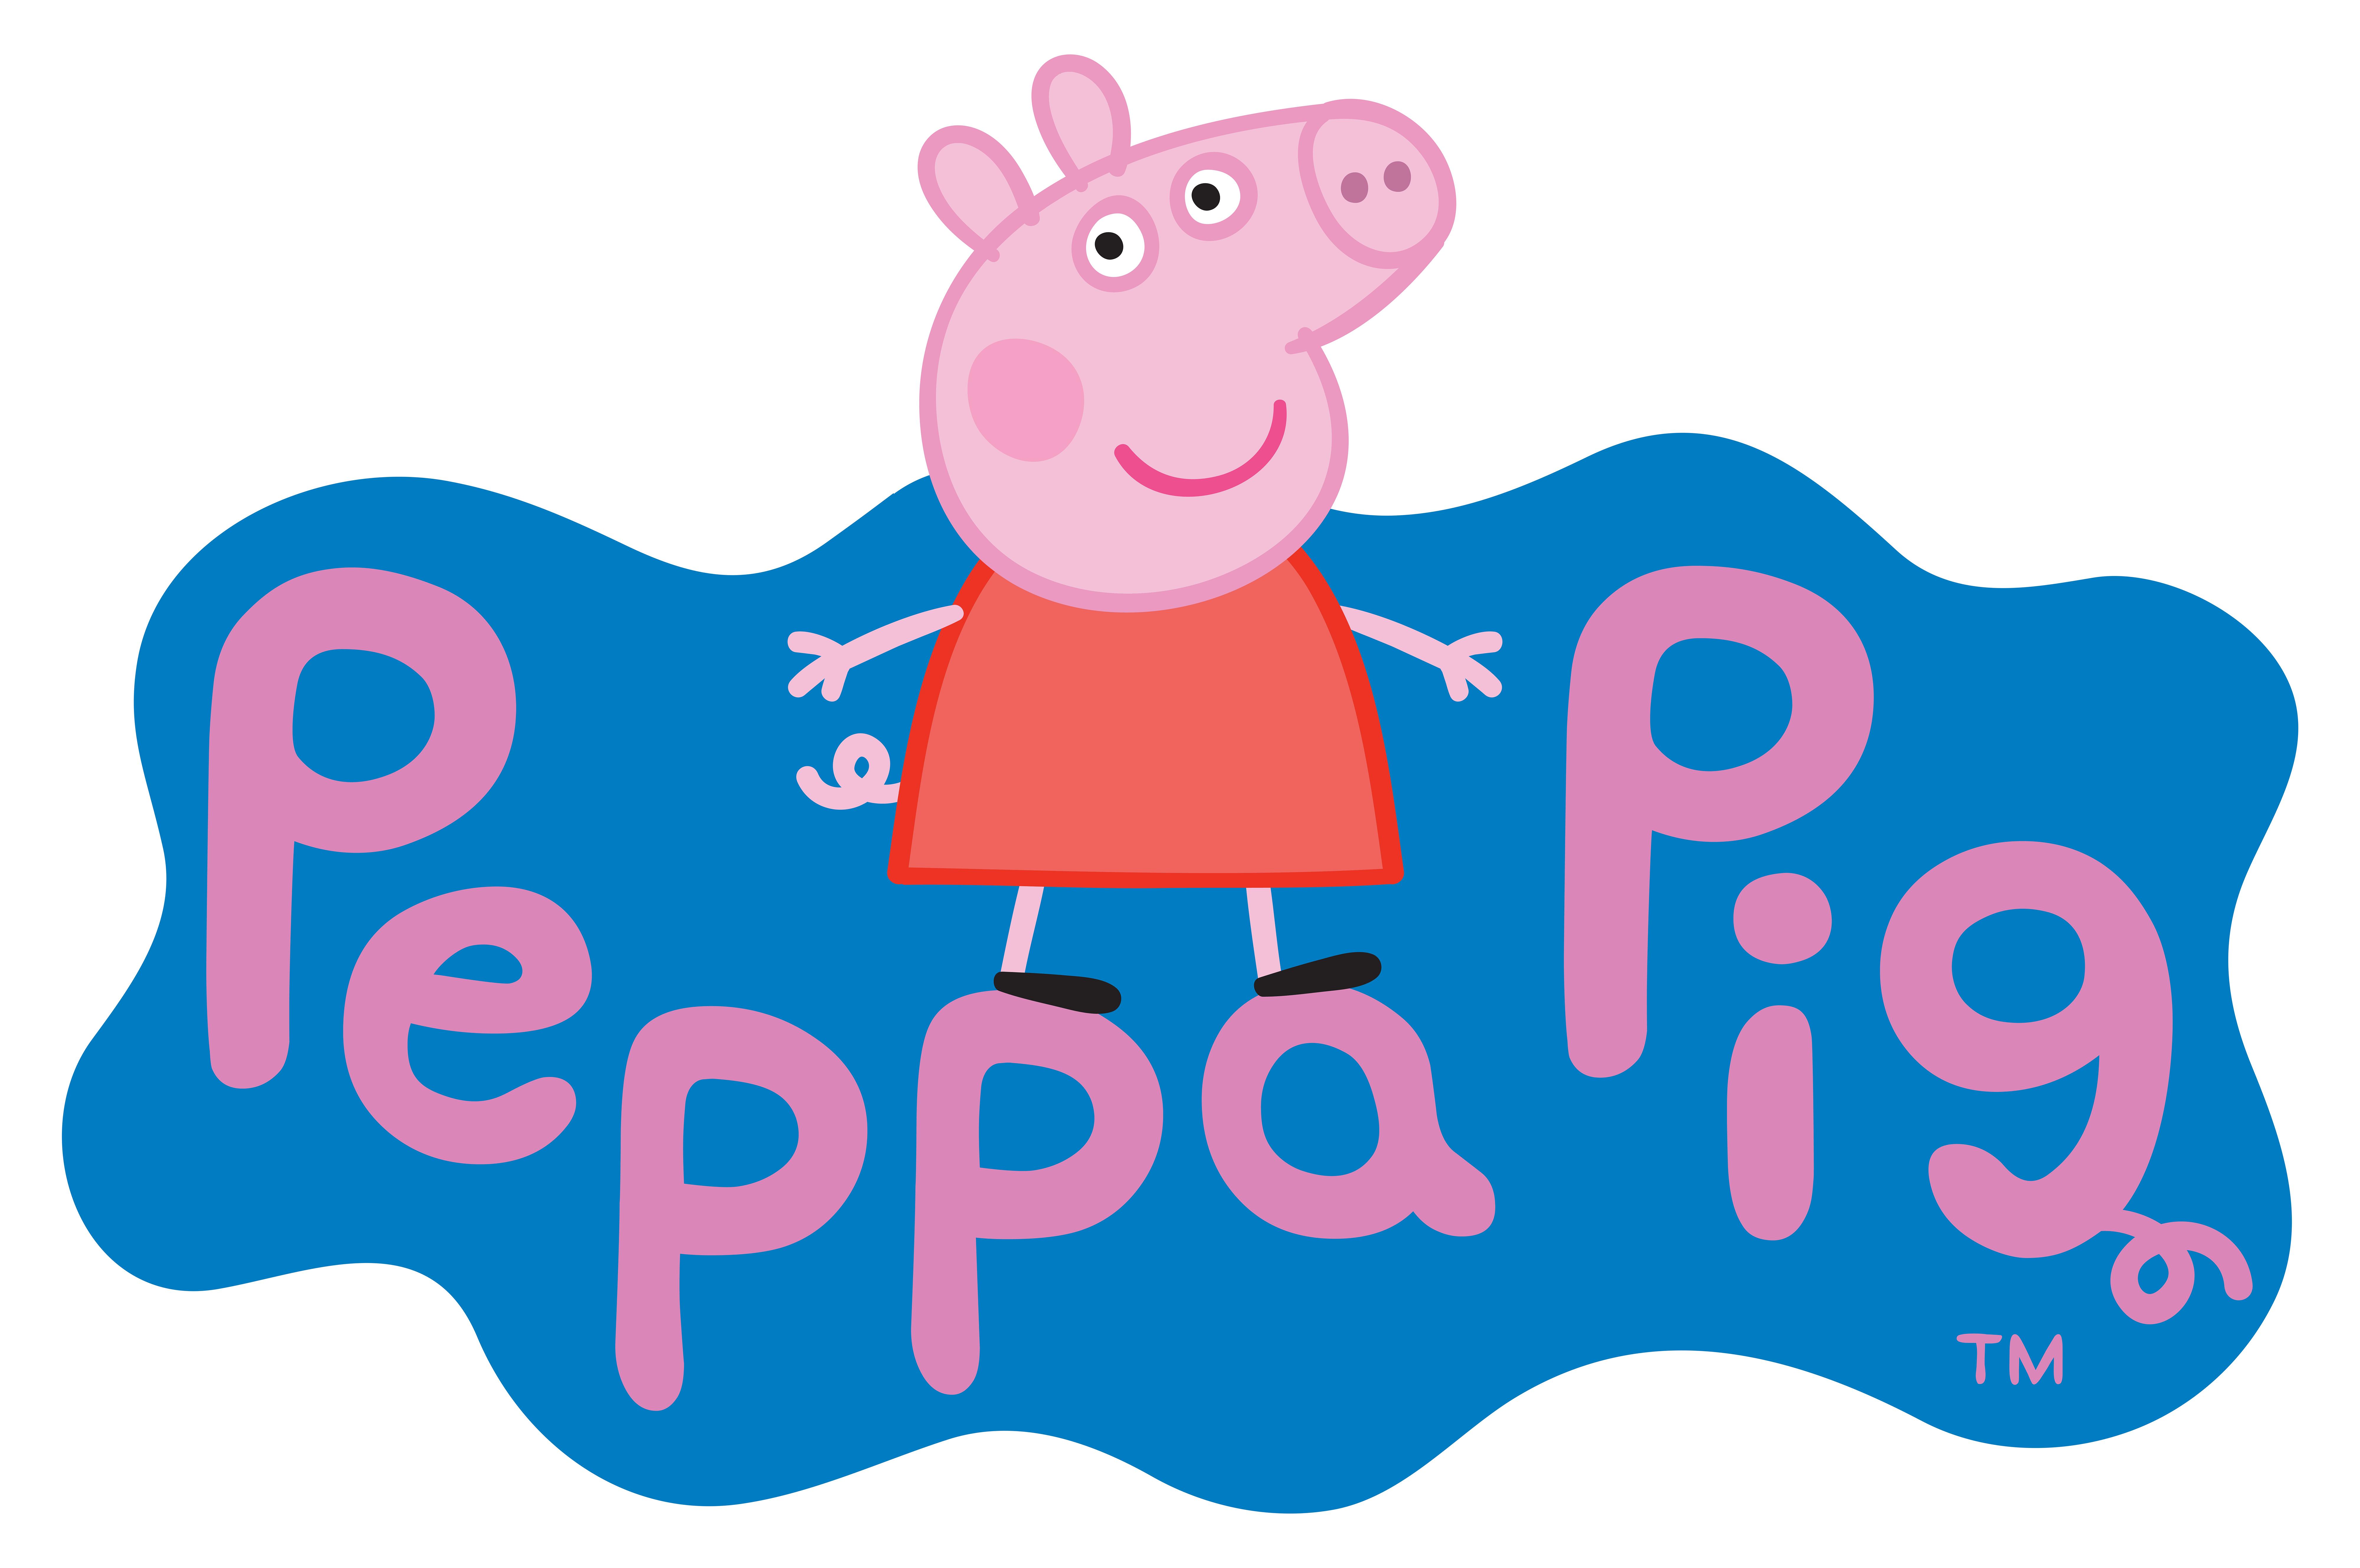 jpg Peppa clipart. Pig logo transparent png.